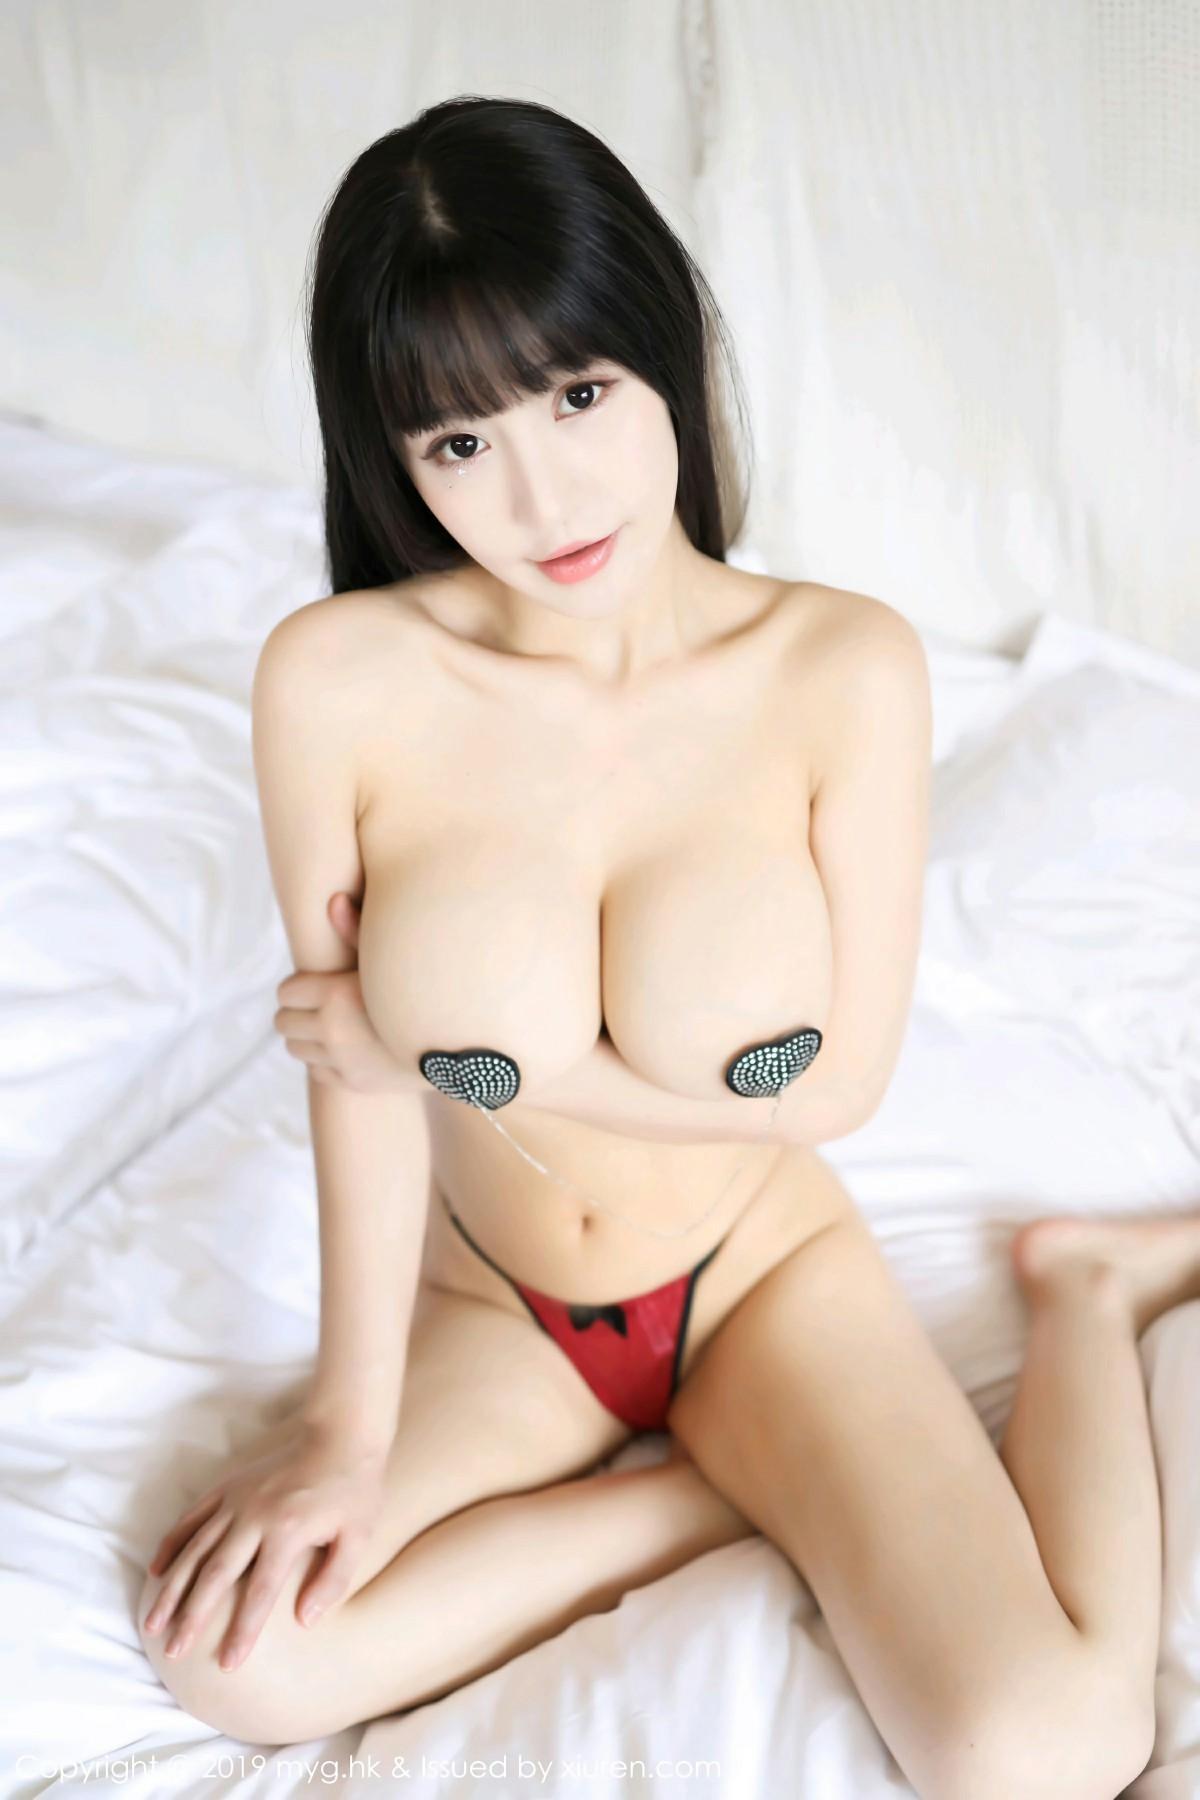 [MyGirl美媛馆]2019.12.11 VOL.412 Flower朱可儿[44P] 美媛馆 第4张